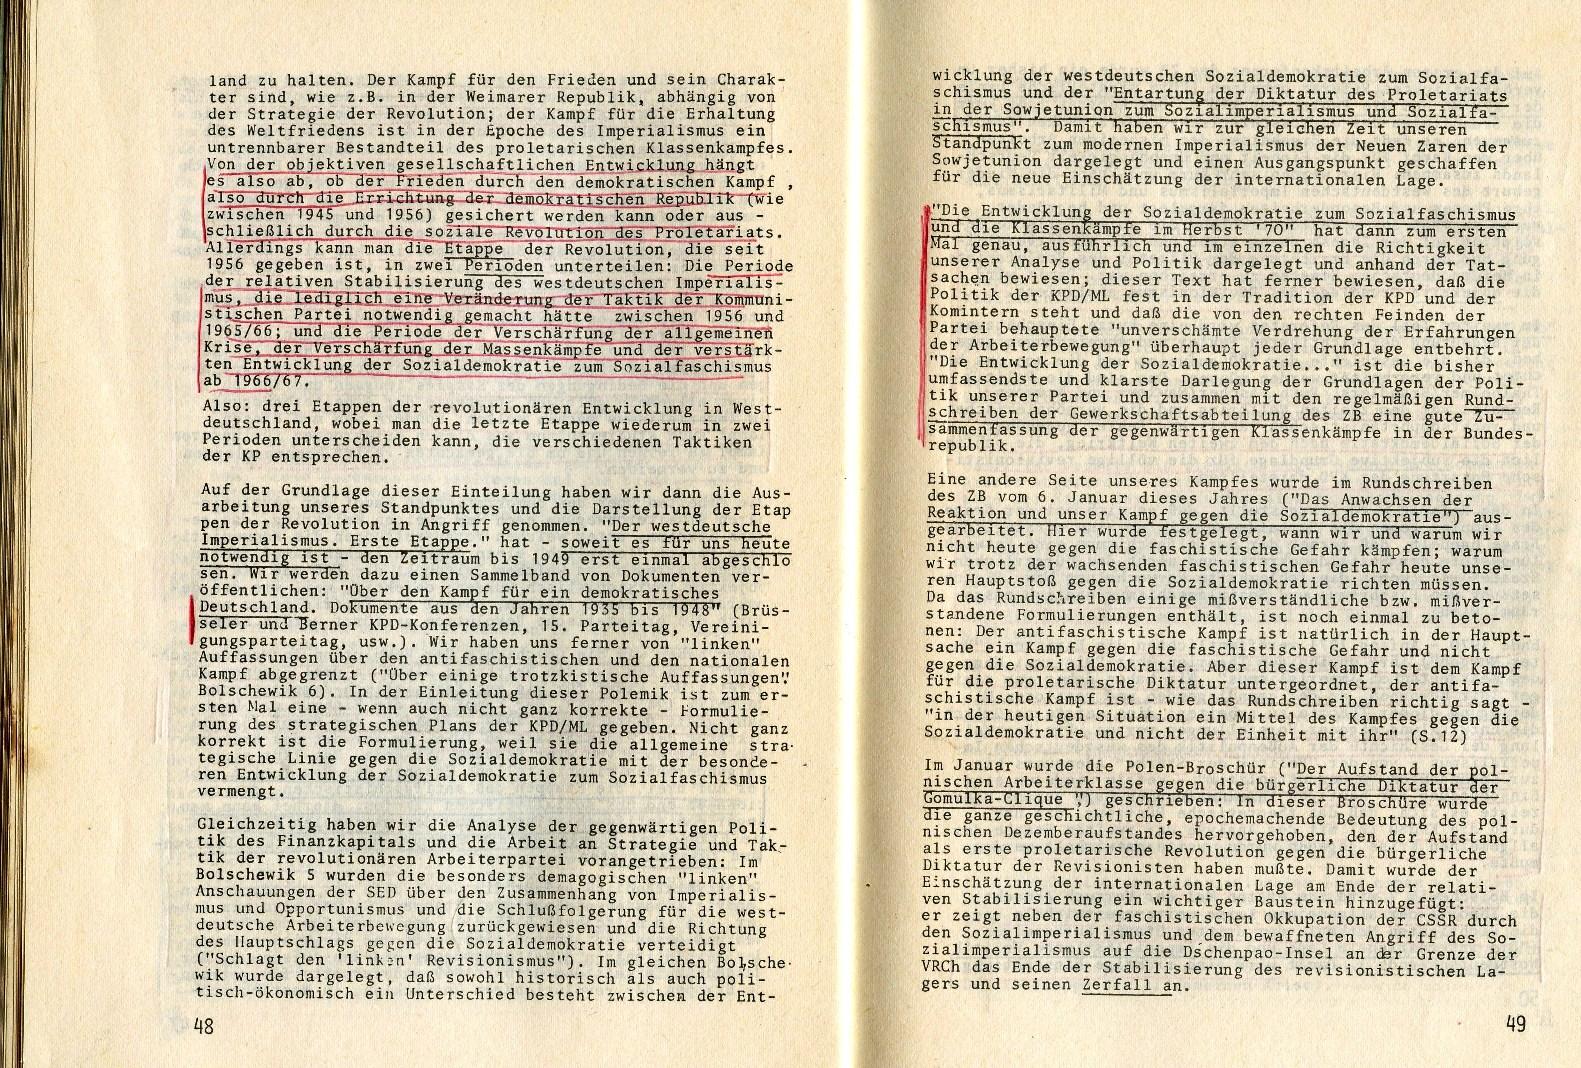 ZB_Parteiarbeiter_1971_05_26